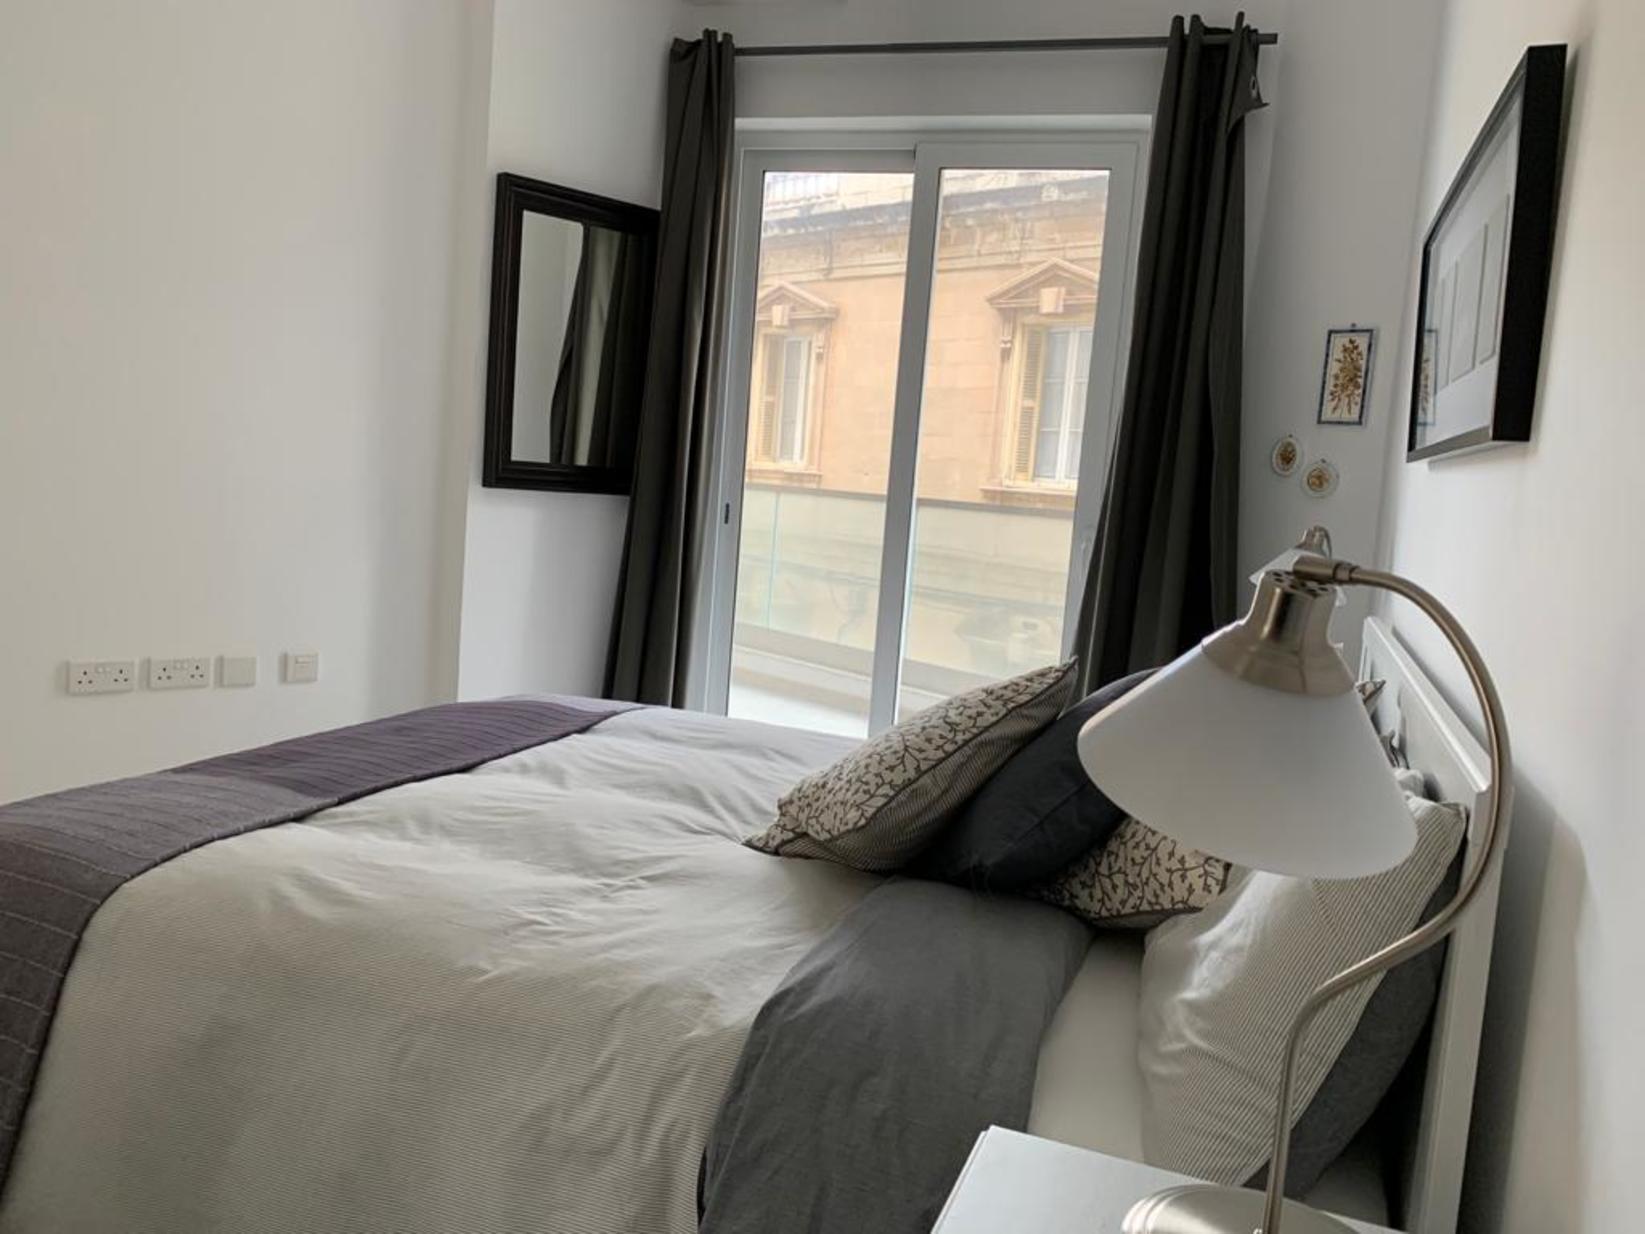 1 bed Apartment For Rent in Sliema, Sliema - thumb 11